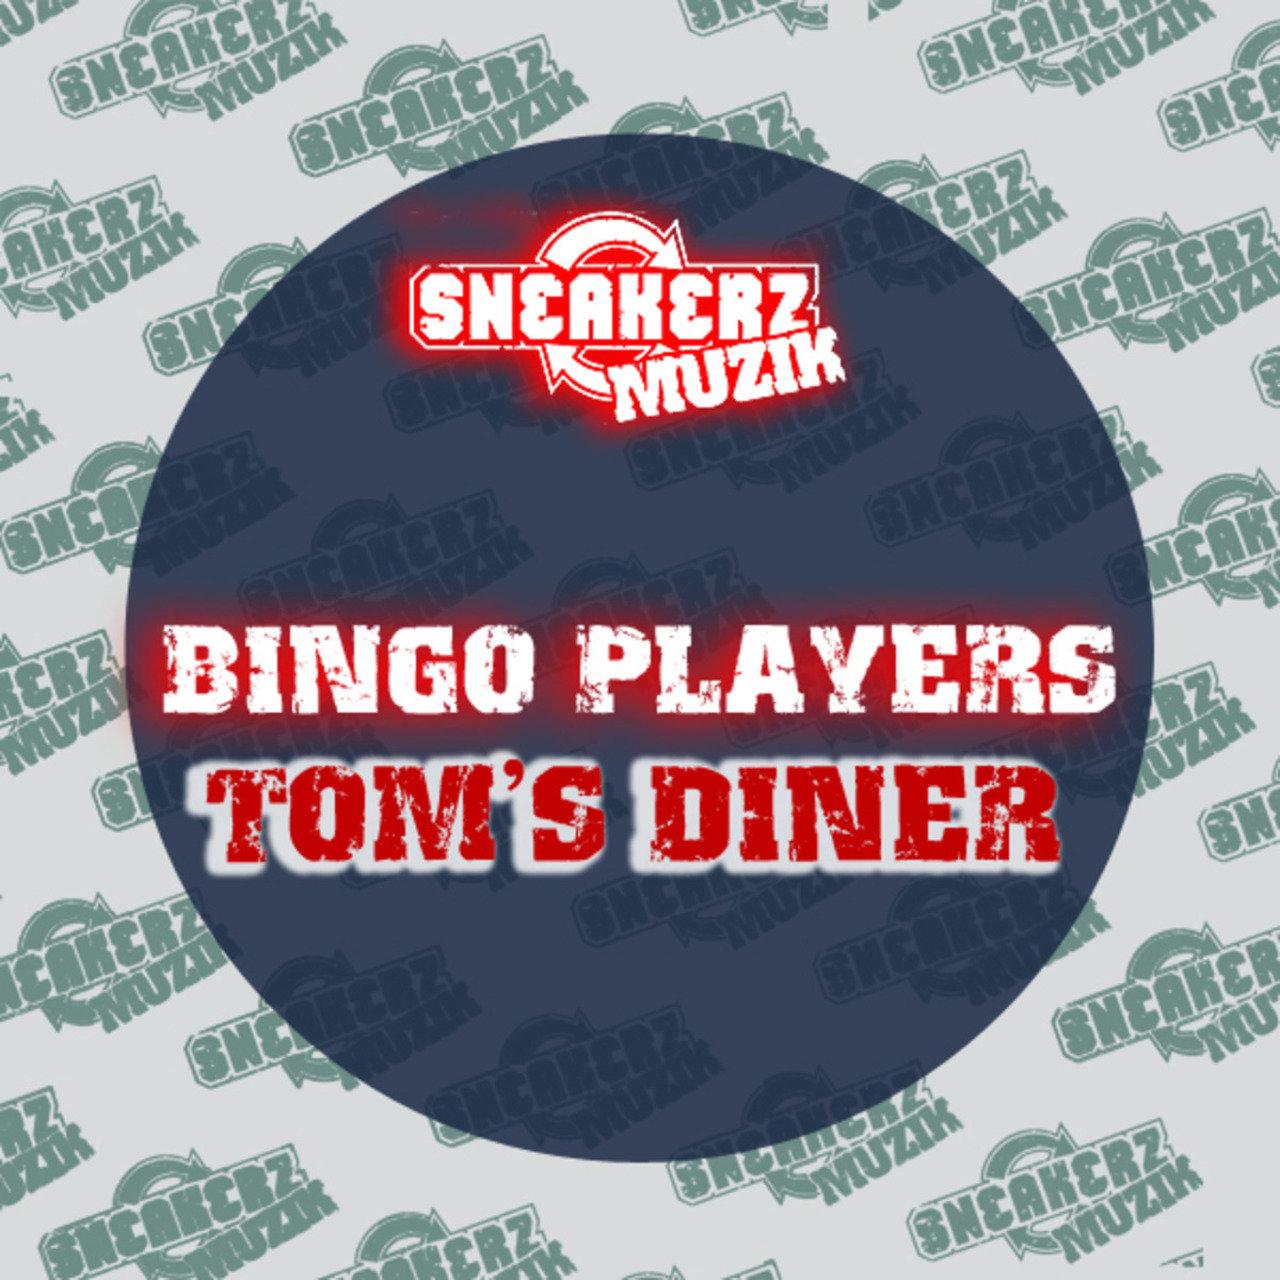 Tom's Diner – Bingo Players